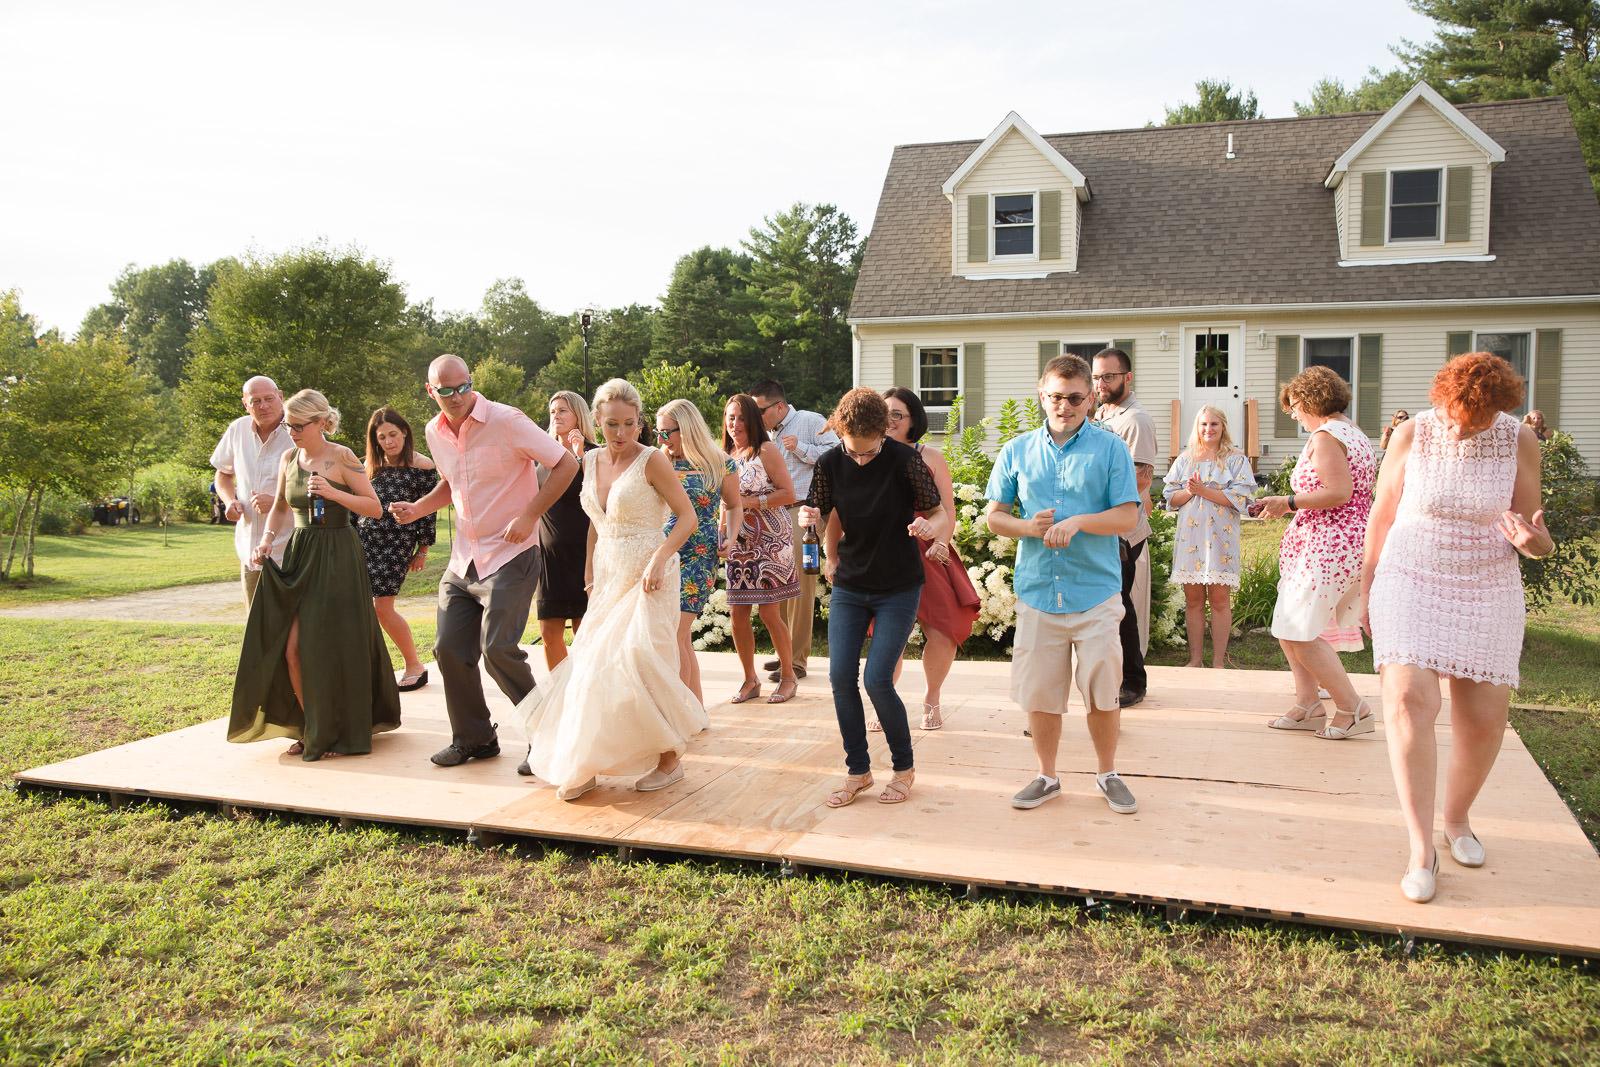 Coventry, Rhode Island, RI, Backyard Wedding, forest, earthy, wedding, tracy jenkins photography, wedding photographer, ri wedding photographer, Rhode Island Wedding photographer, wedding reception, dance floor